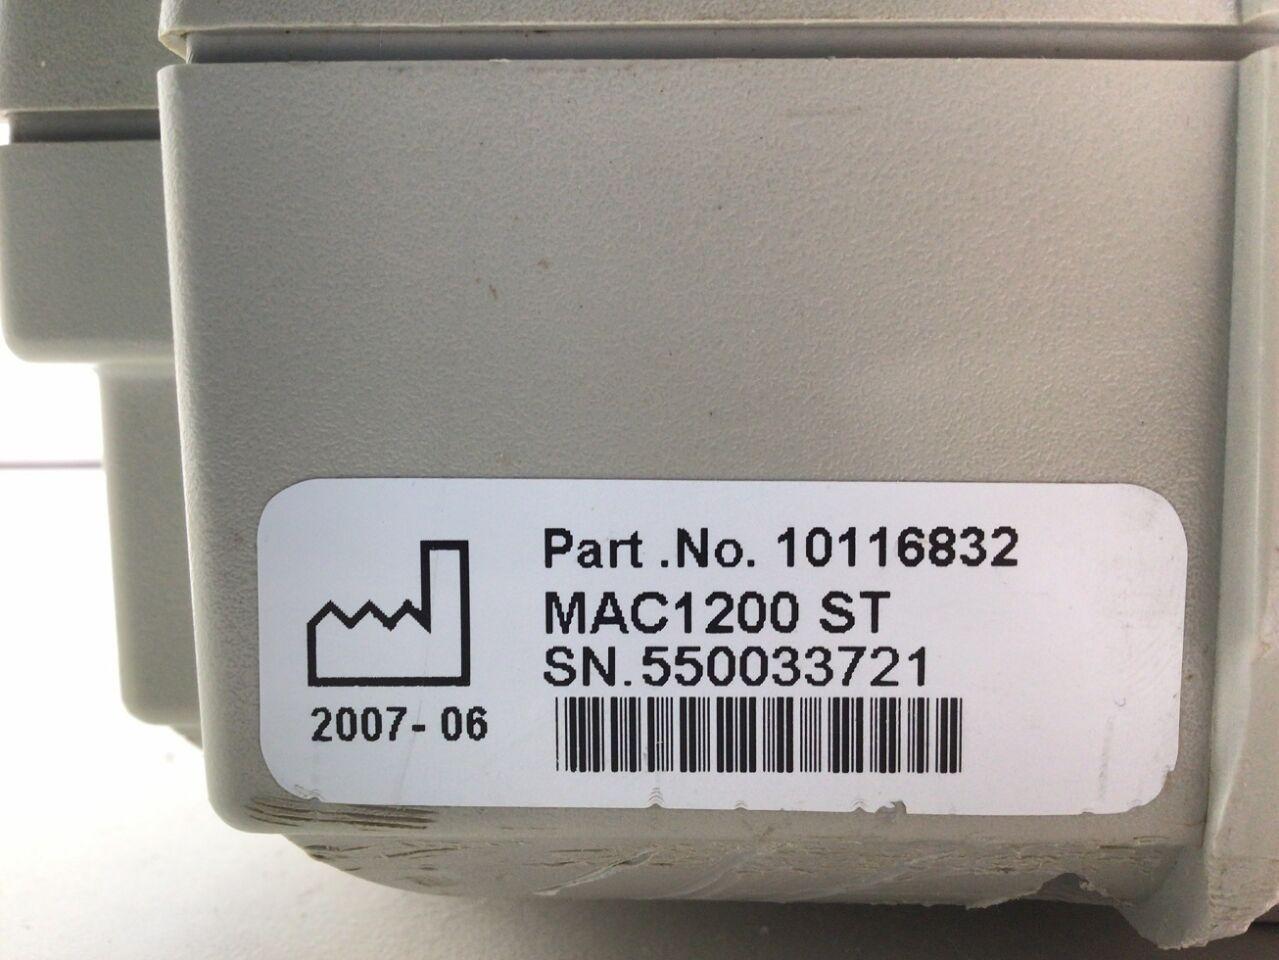 GENERAL ELECTRICS MAC 1200 ST ECG unit